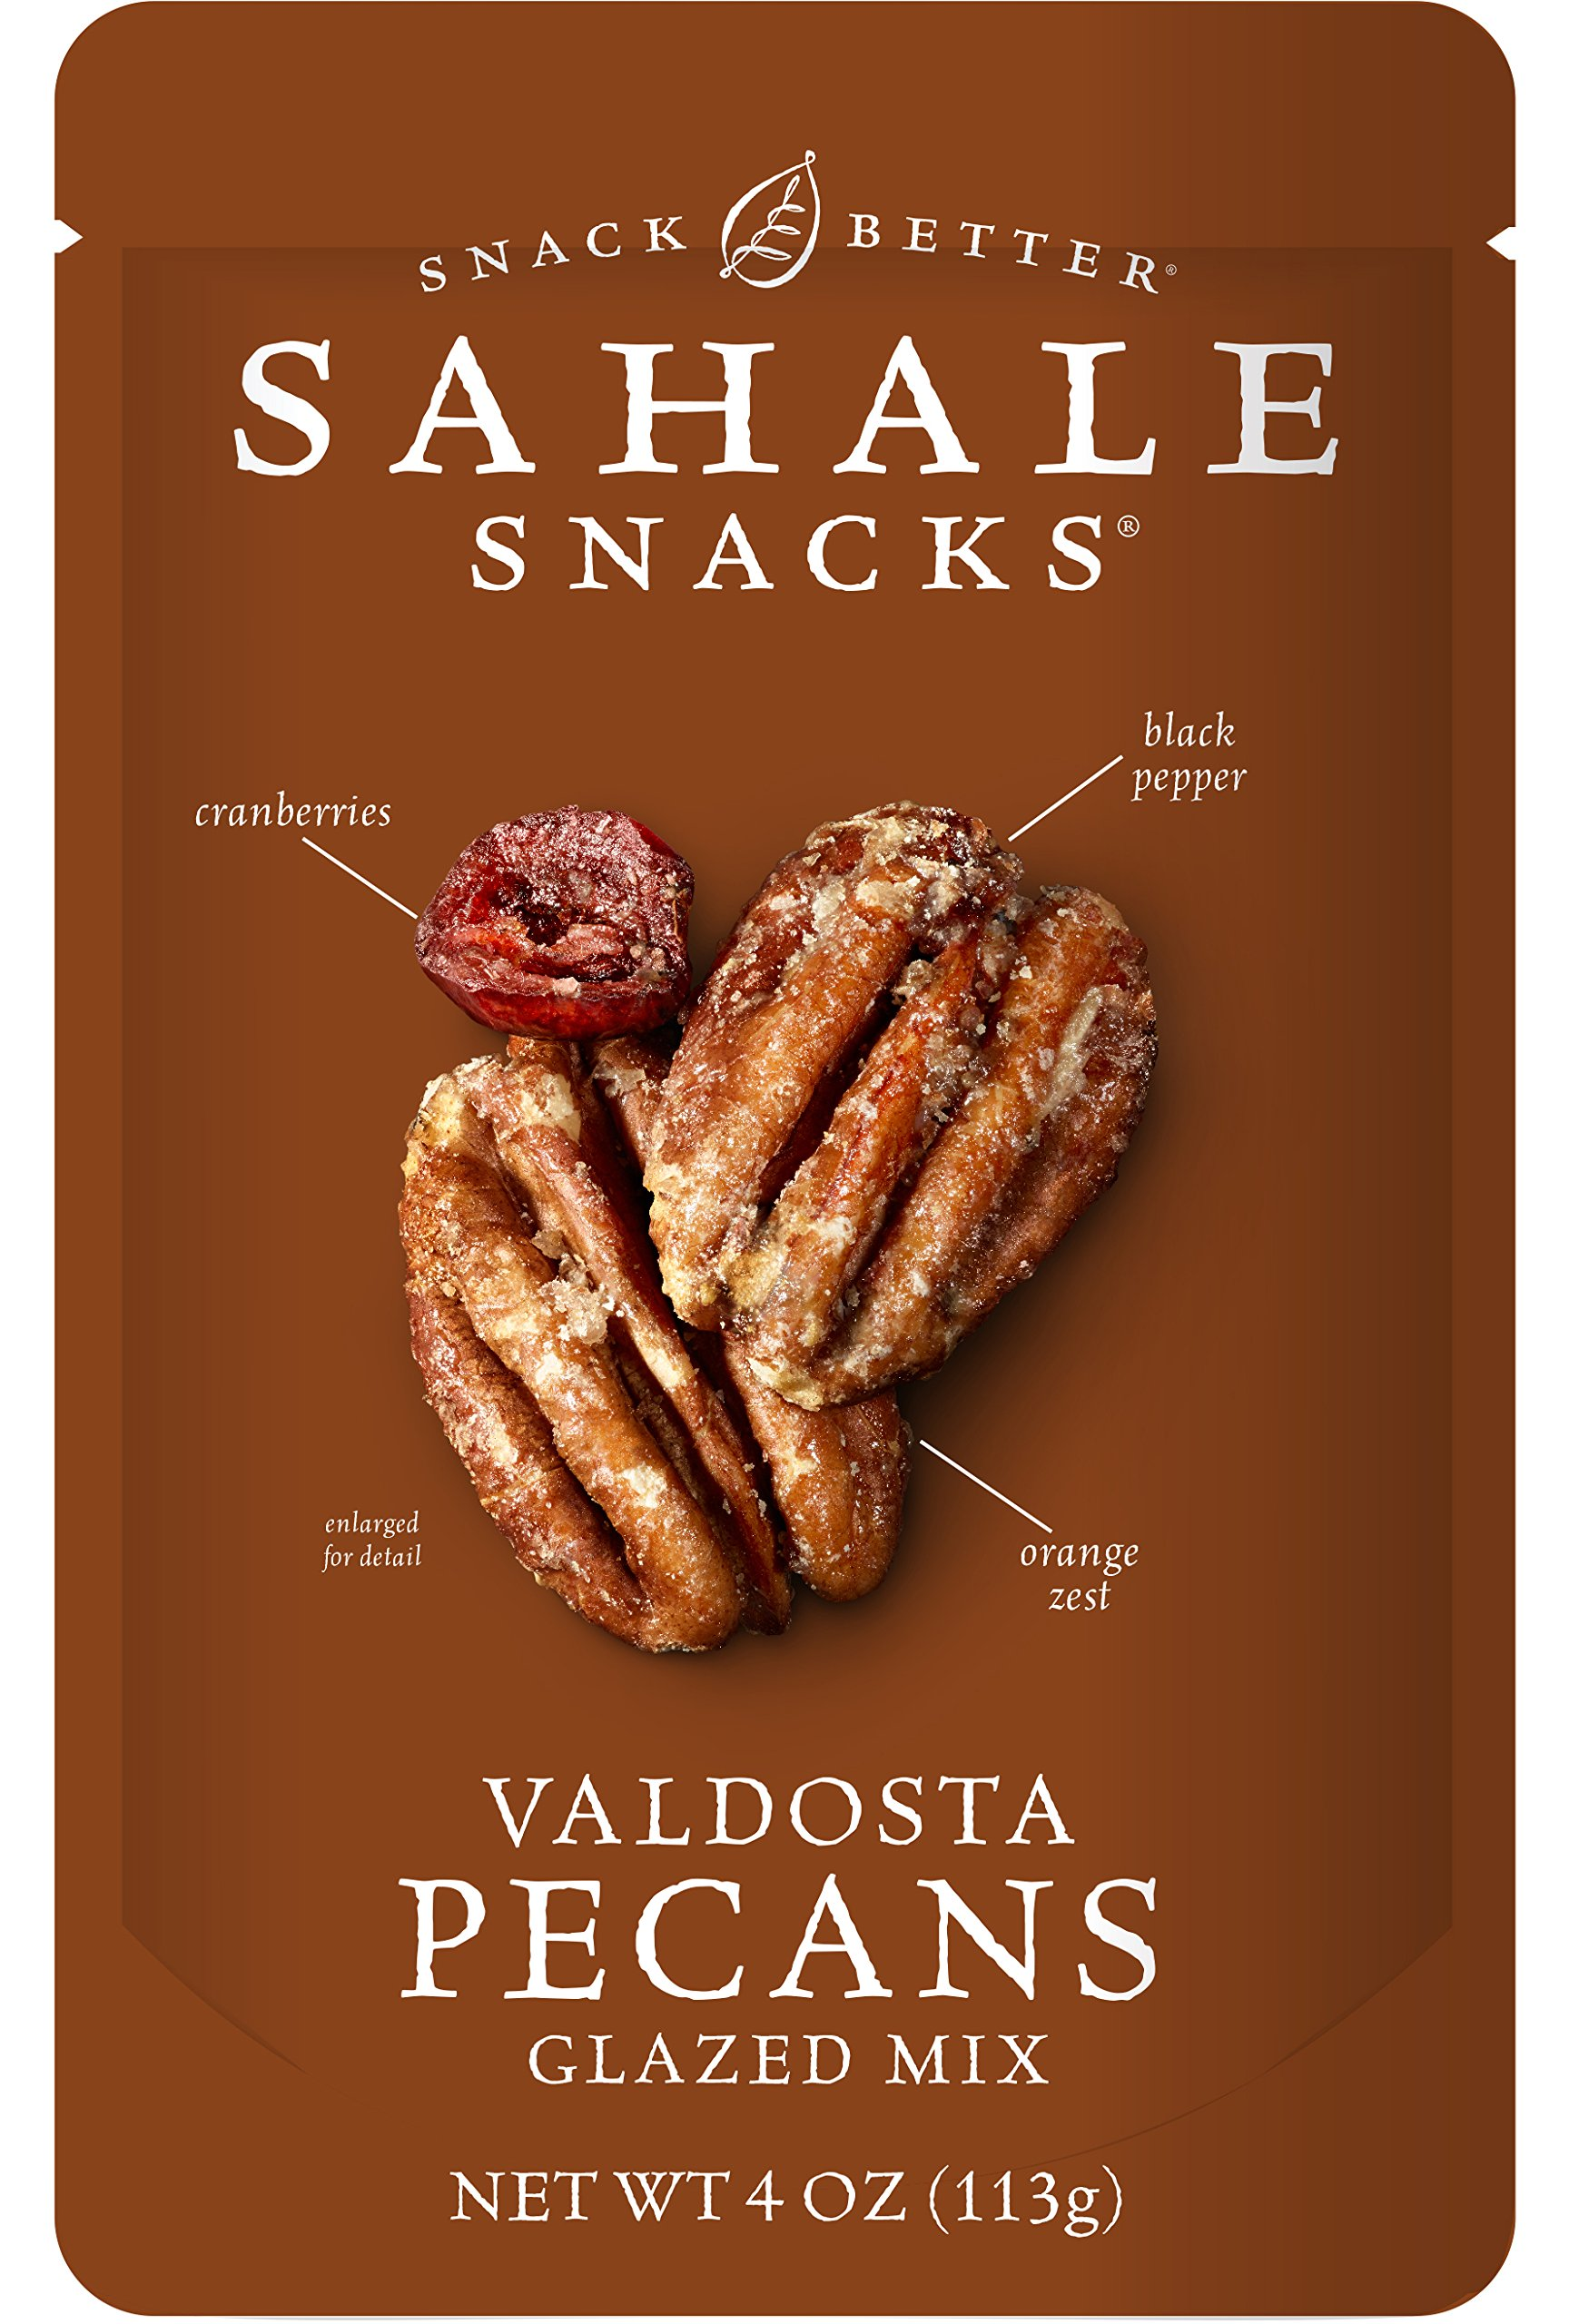 Sahale Snacks Valdosta Pecans Glazed Mix, 4 Ounce (Pack of 6)